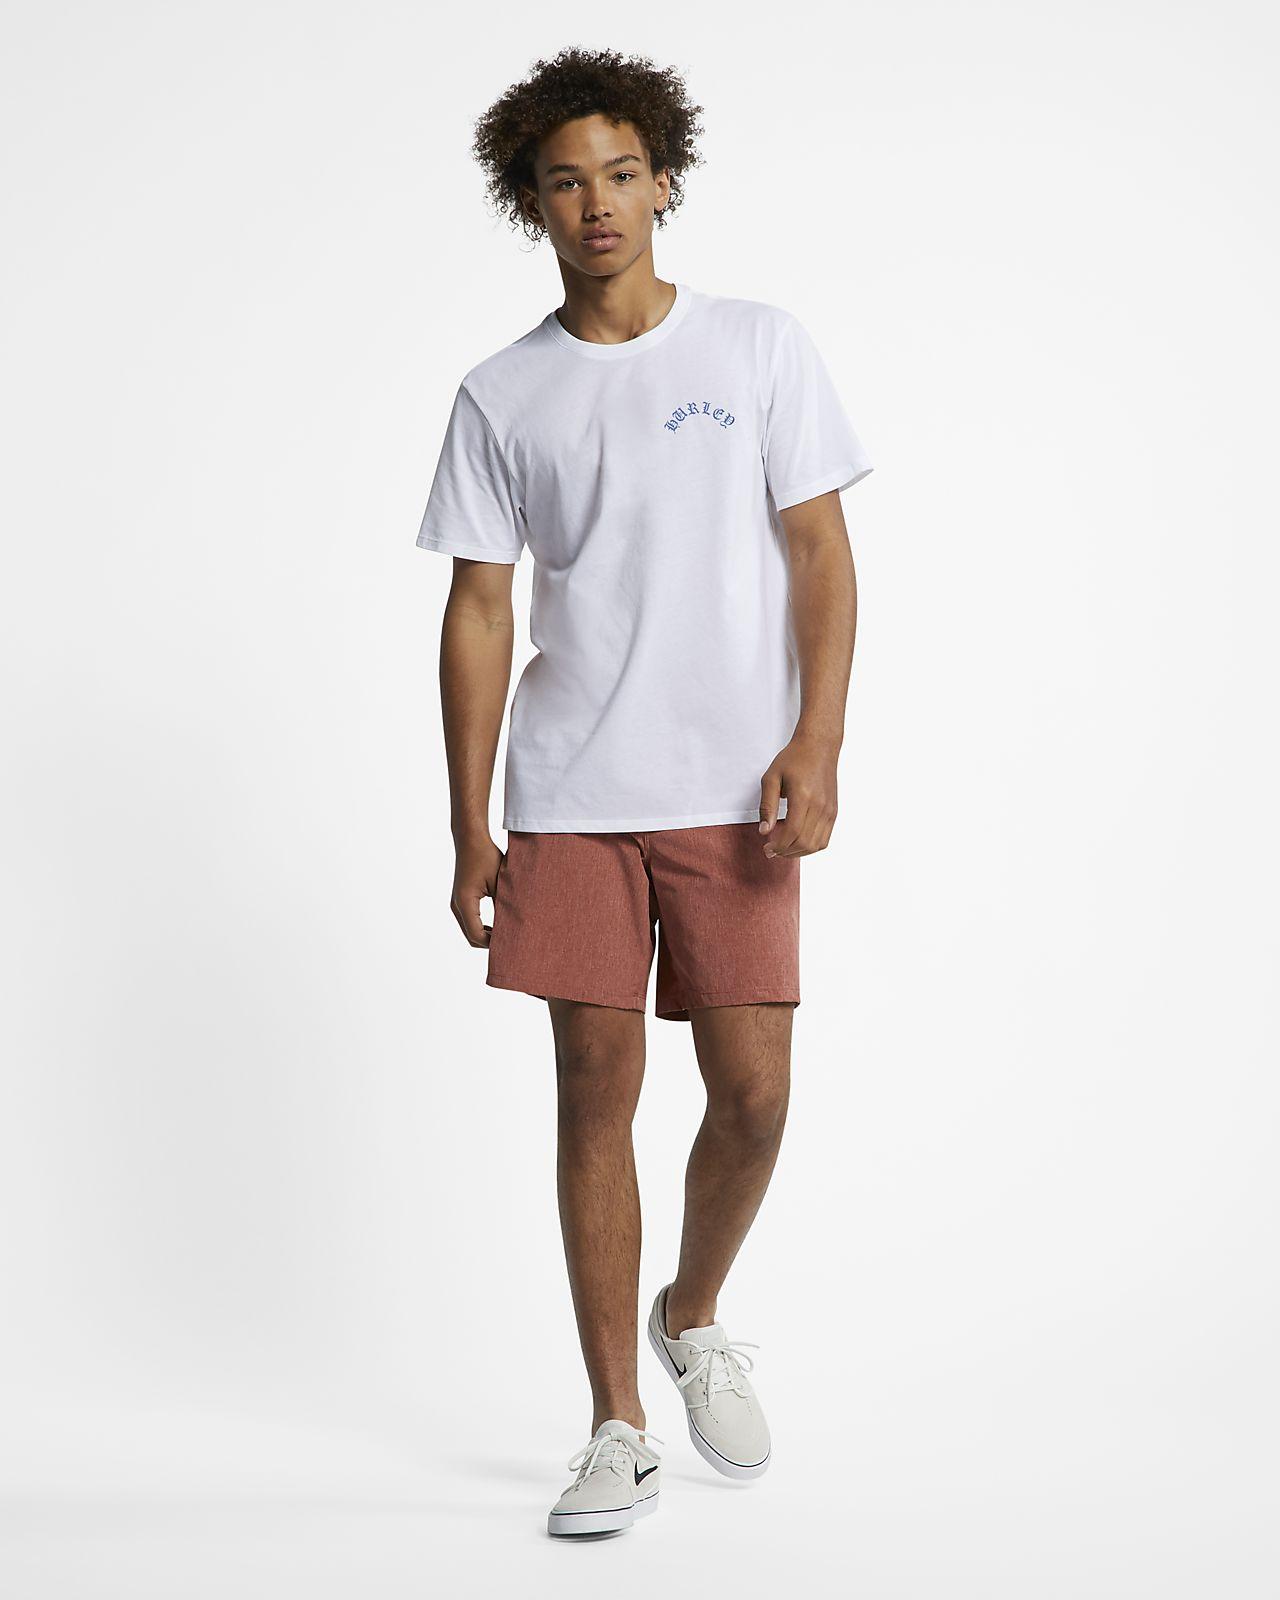 6599b305c Hurley Dri-FIT Pray For Waves Men's T-Shirt. Nike.com